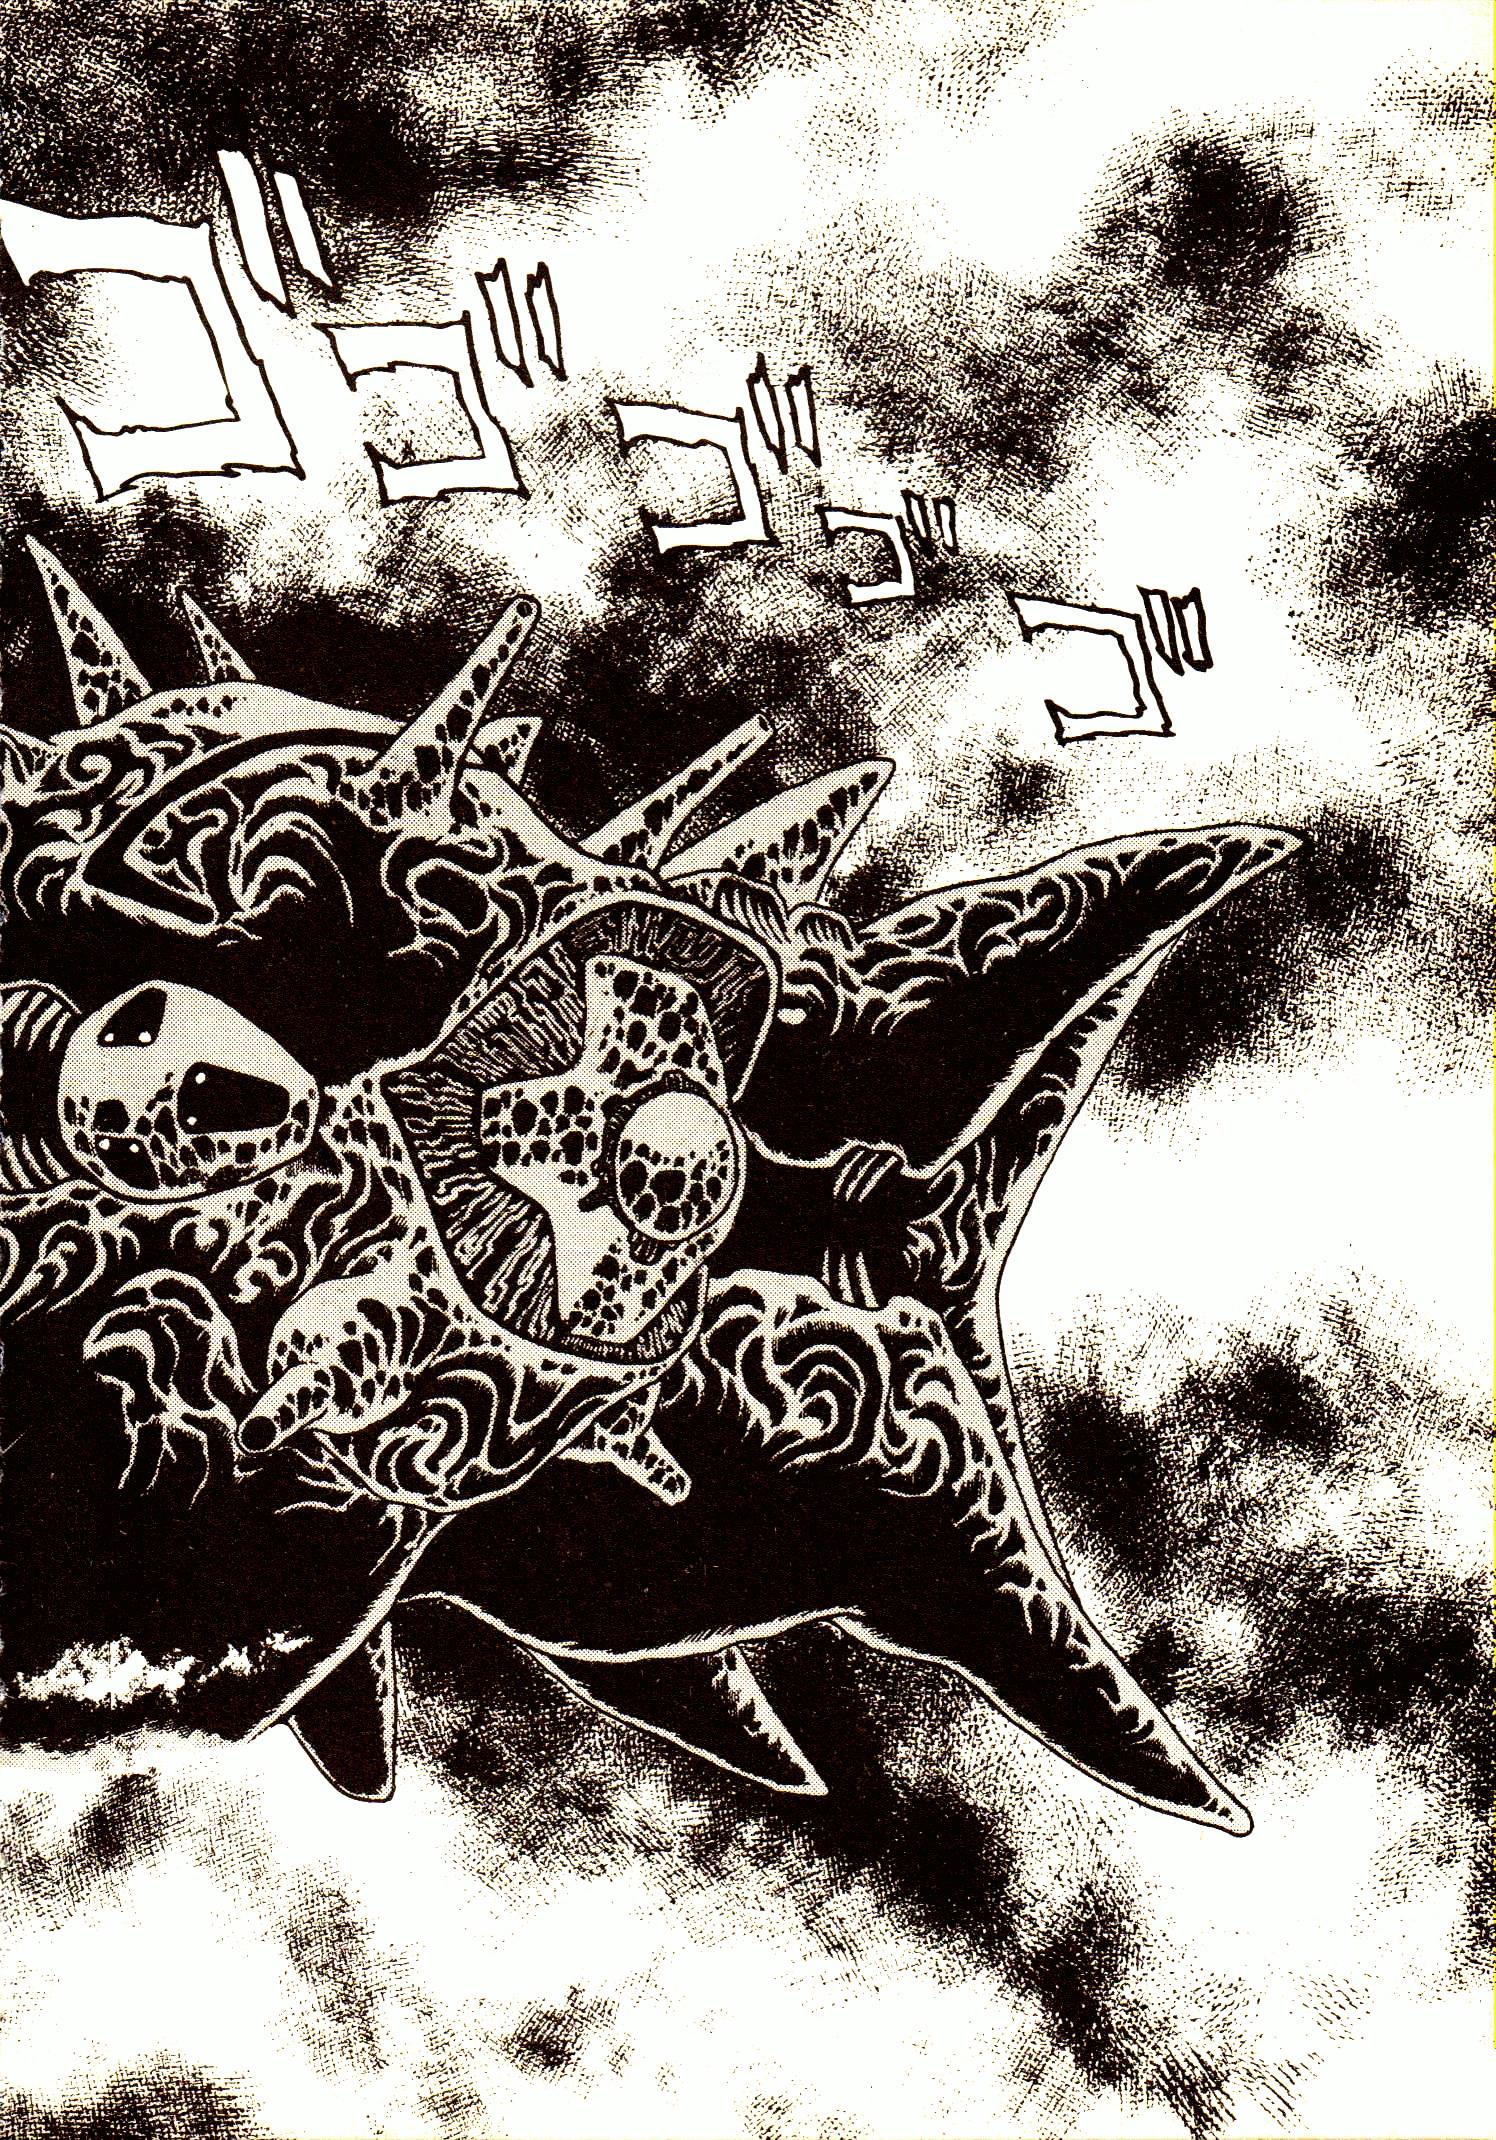 Capricorn - Chapter 1